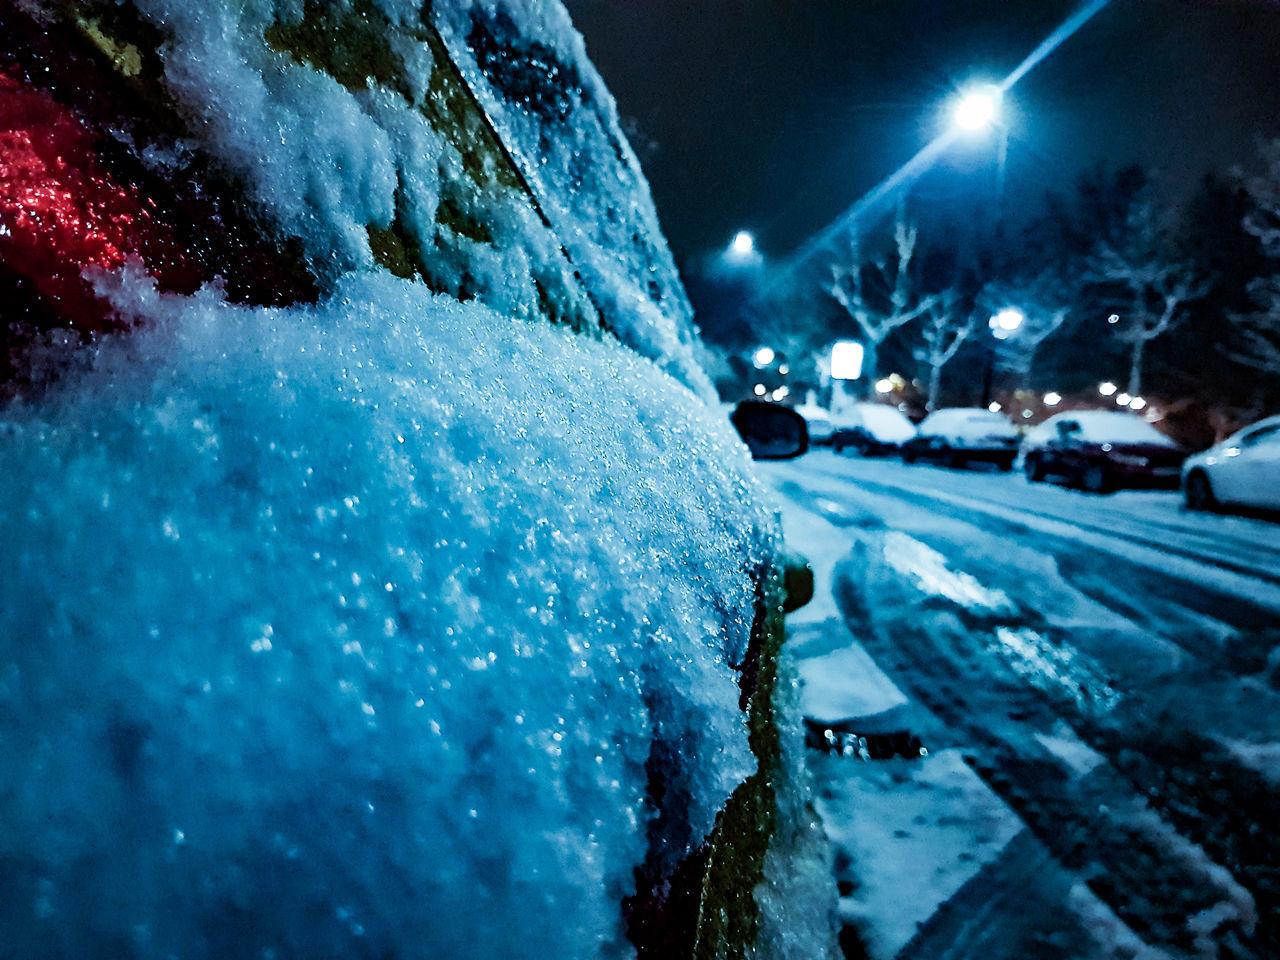 CLOSE-UP OF SNOW ON ILLUMINATED ROAD AT NIGHT